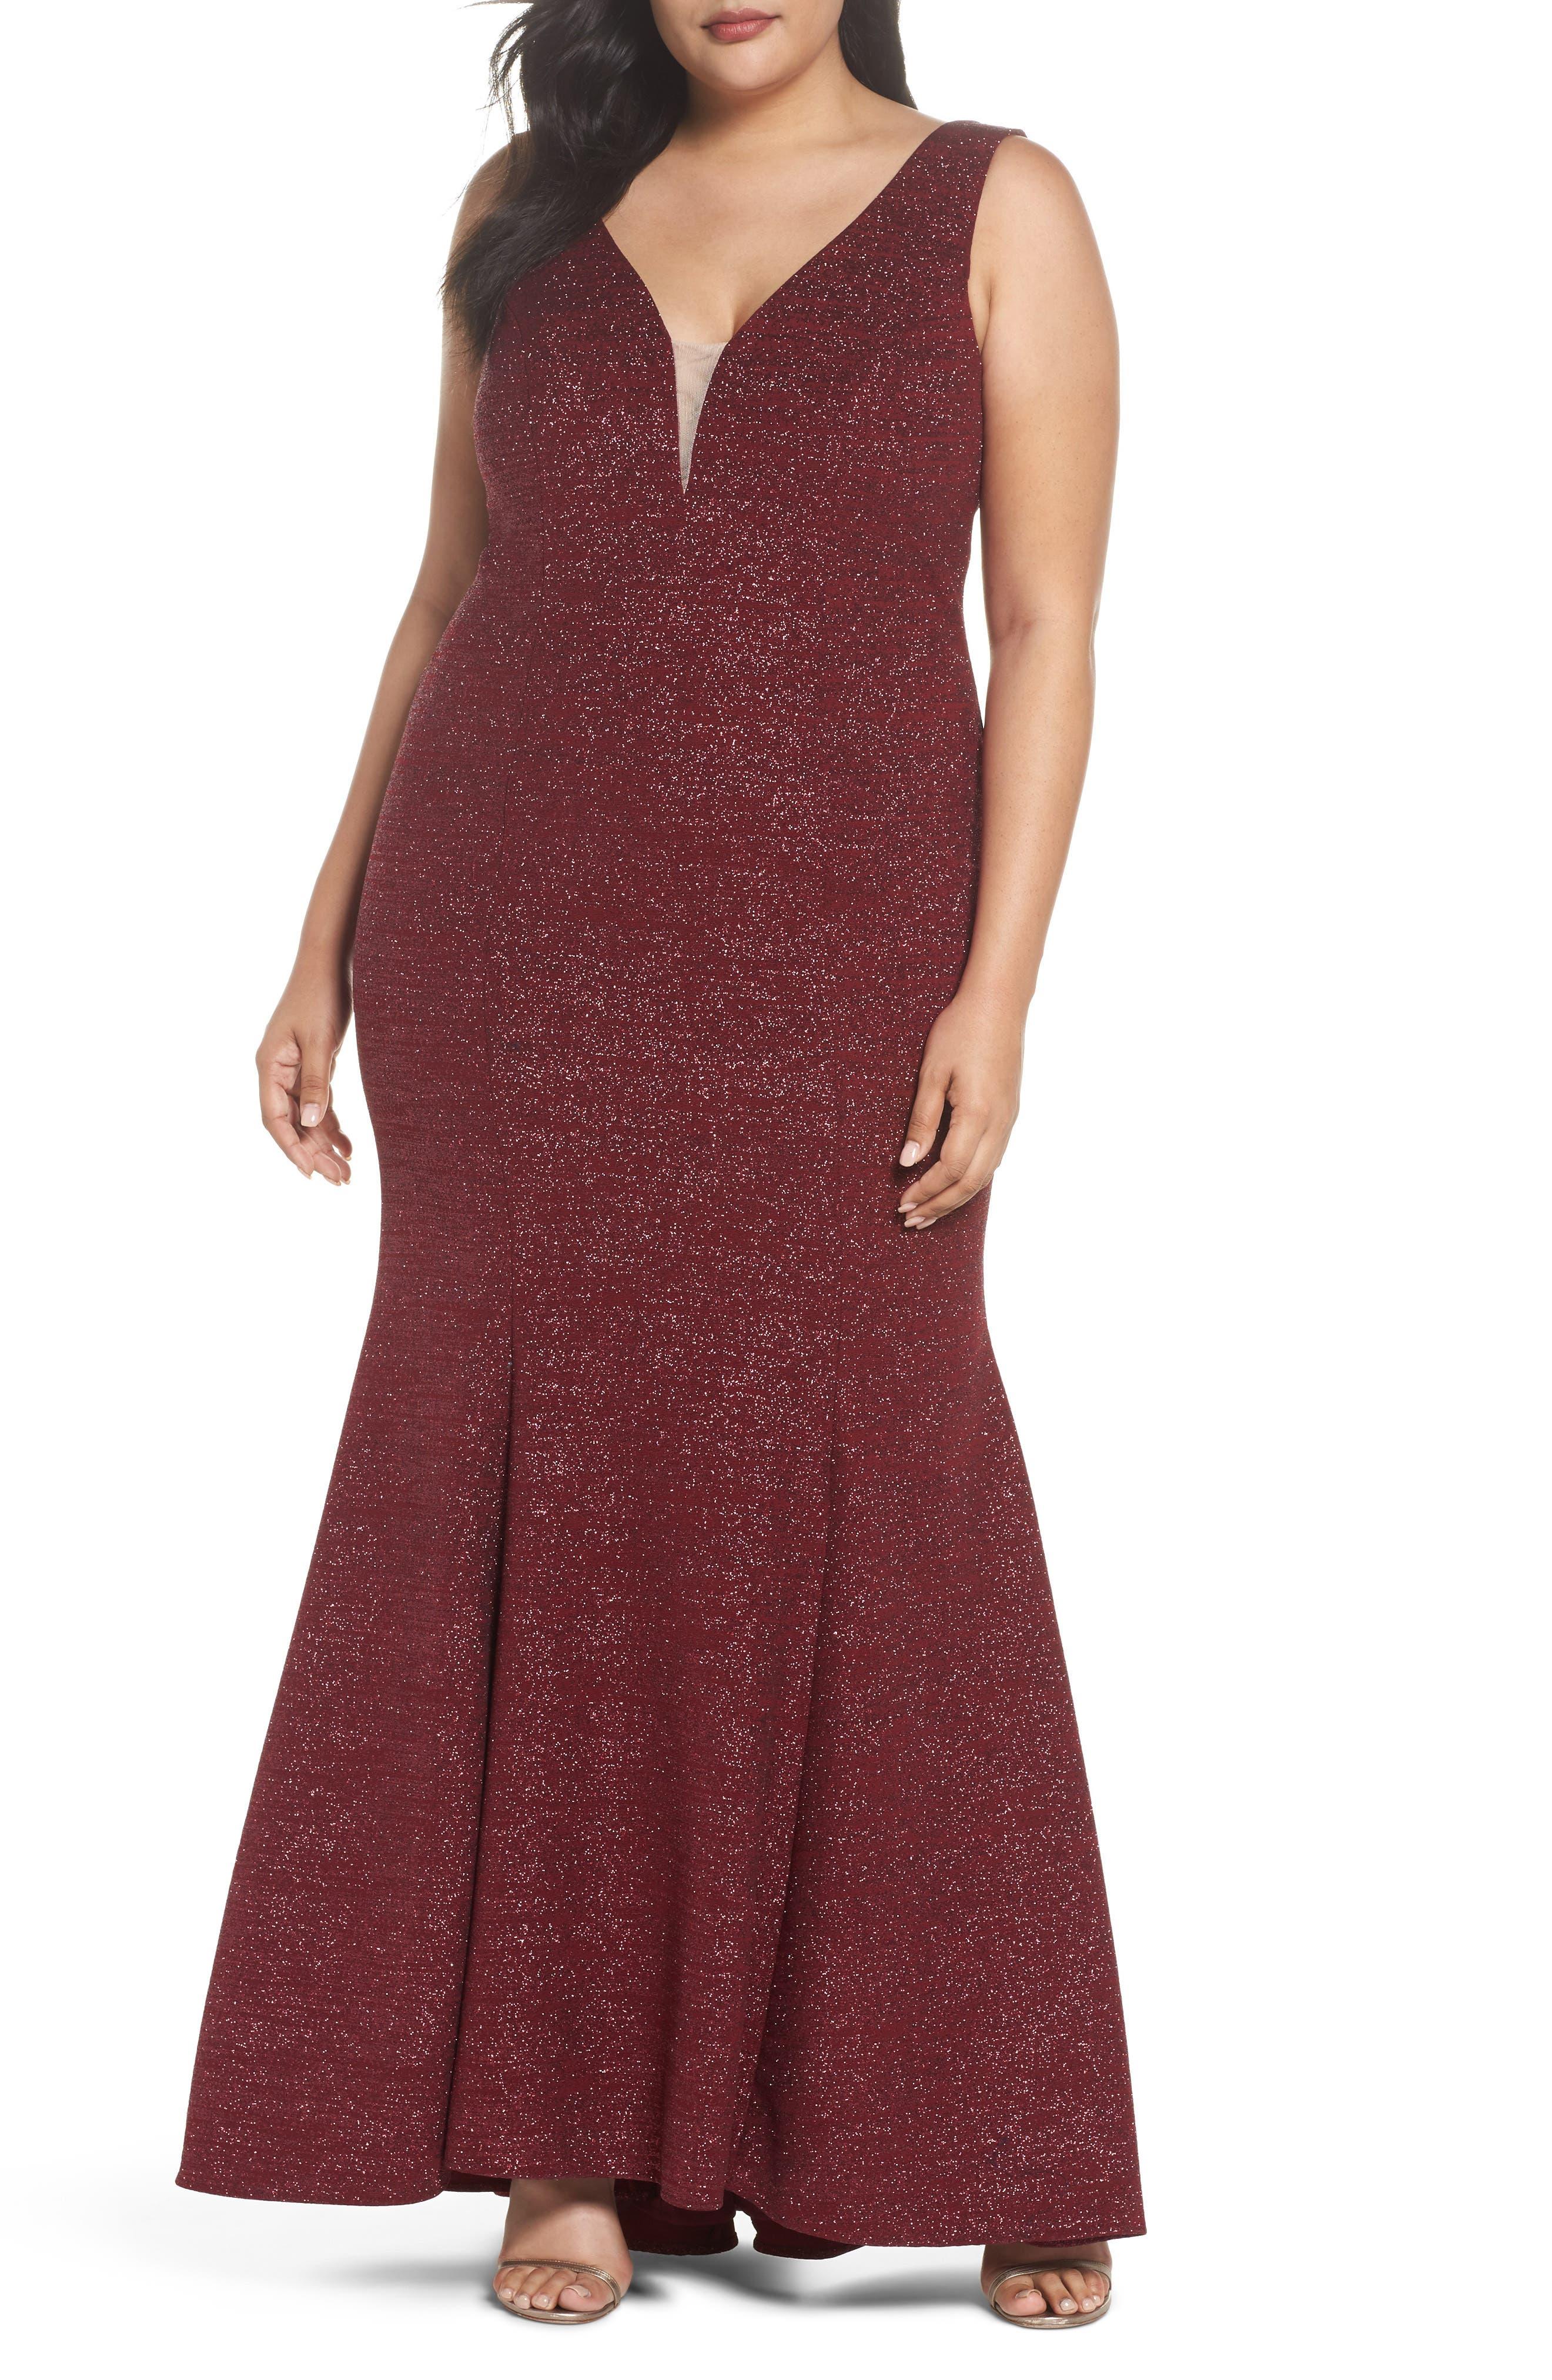 Alternate Image 1 Selected - Xscape Metallic Knit Mermaid Gown (Plus Size)